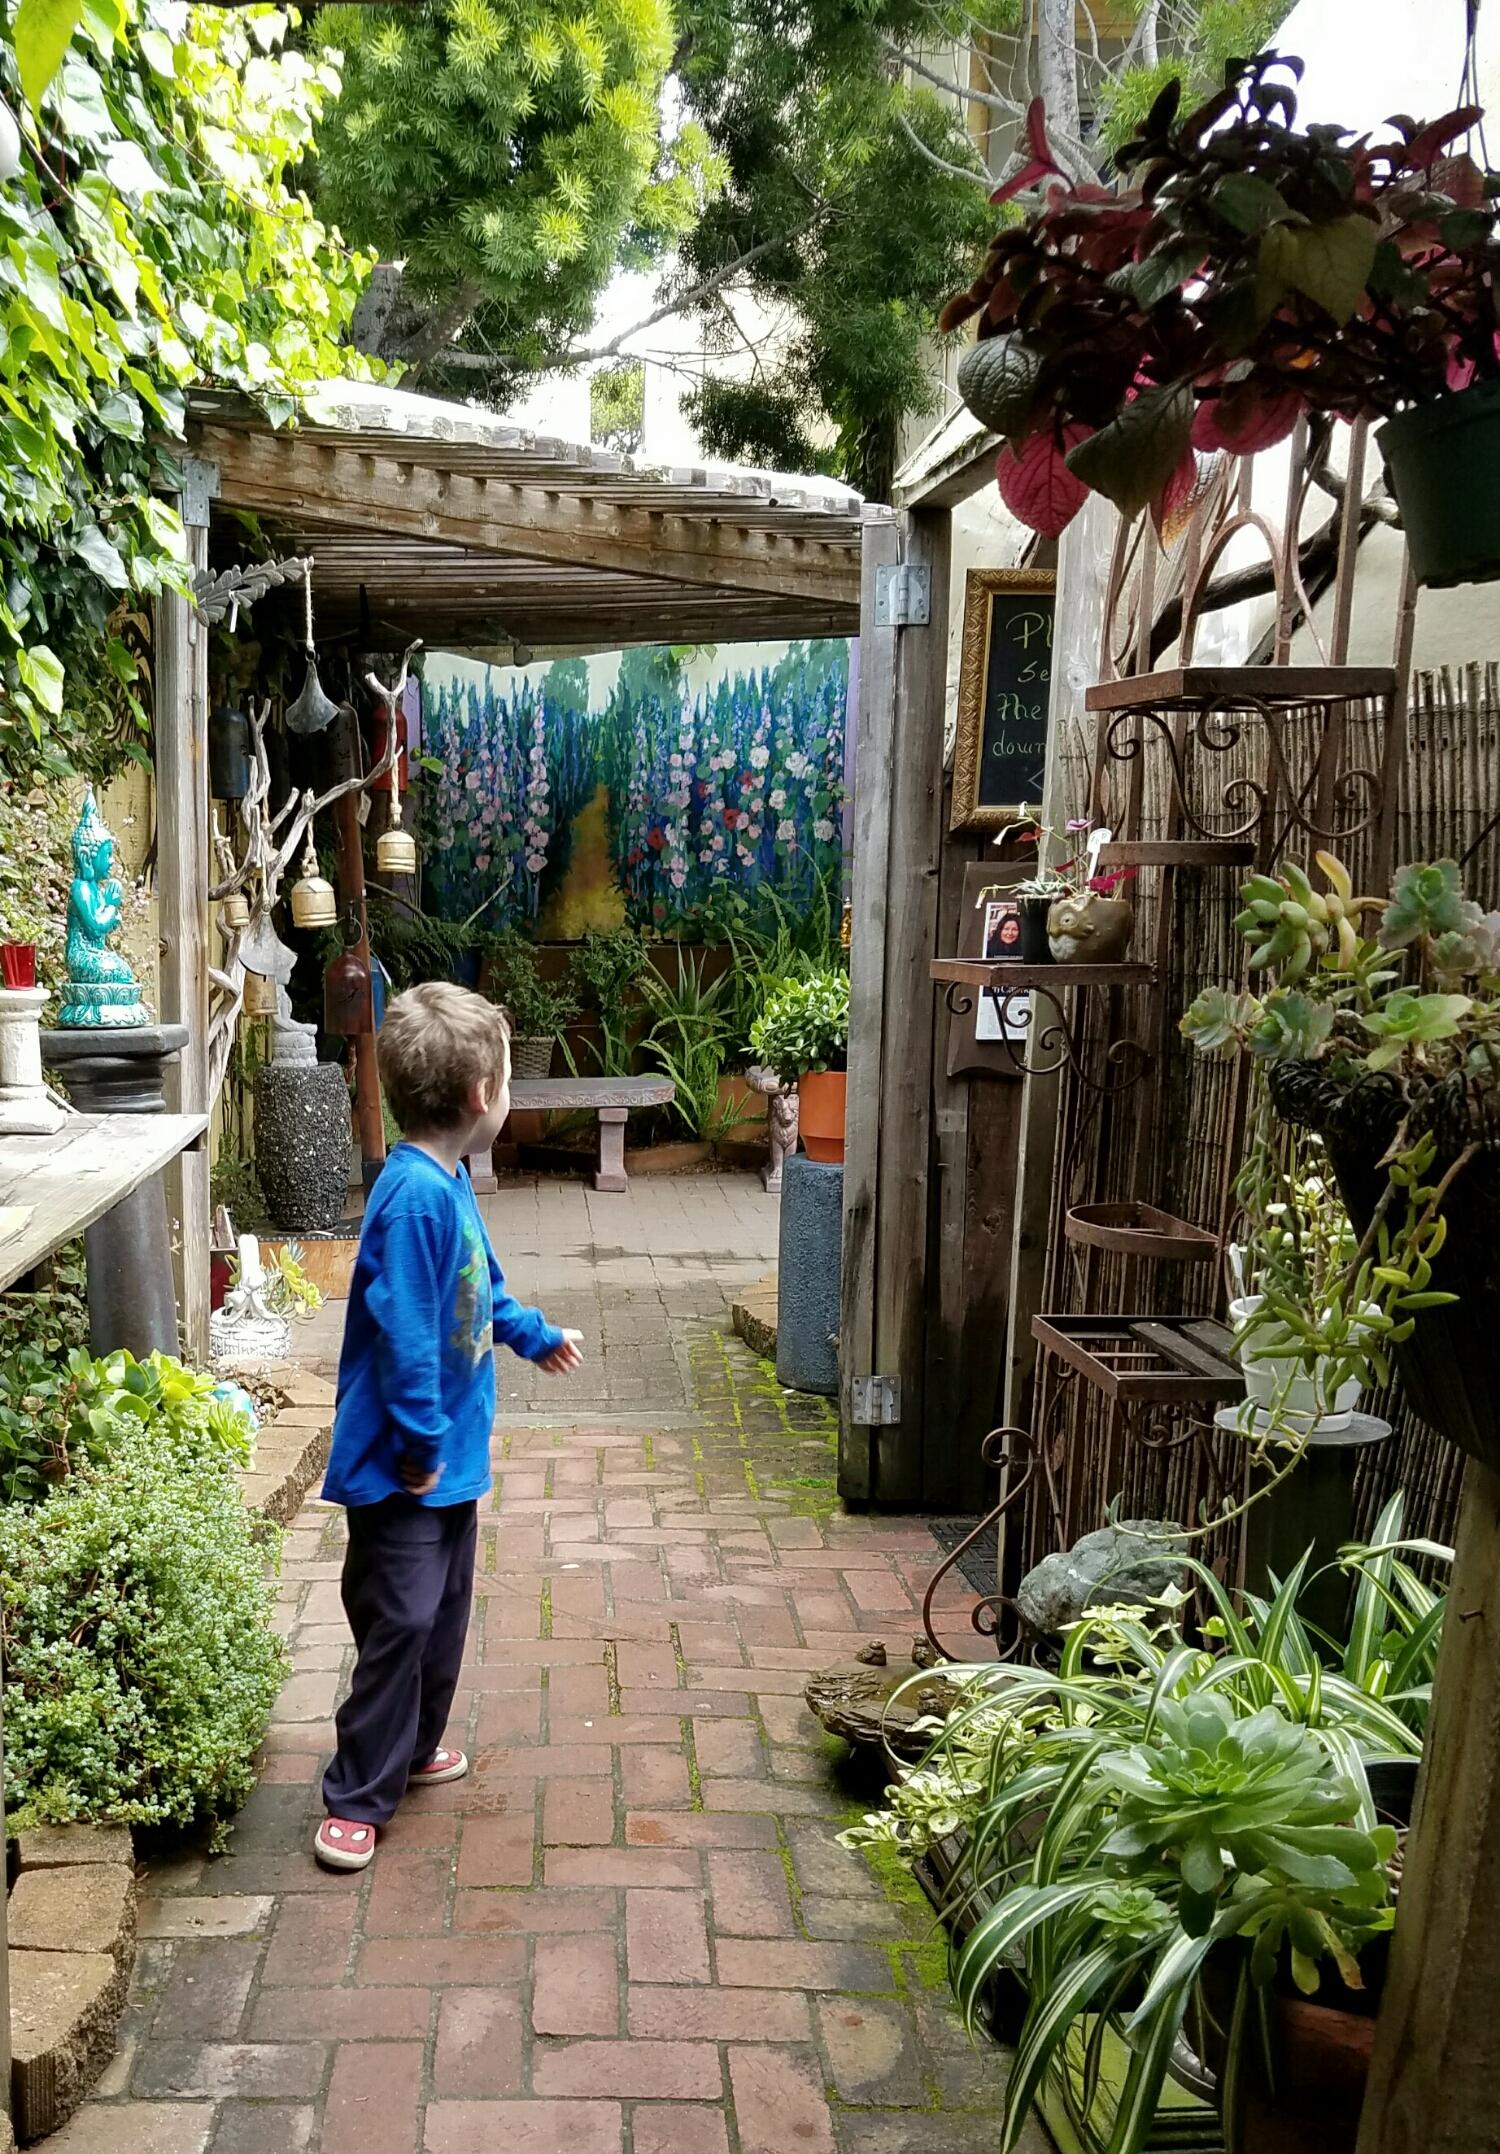 The Secret Garden in the village of Carmel By the Sea, California.